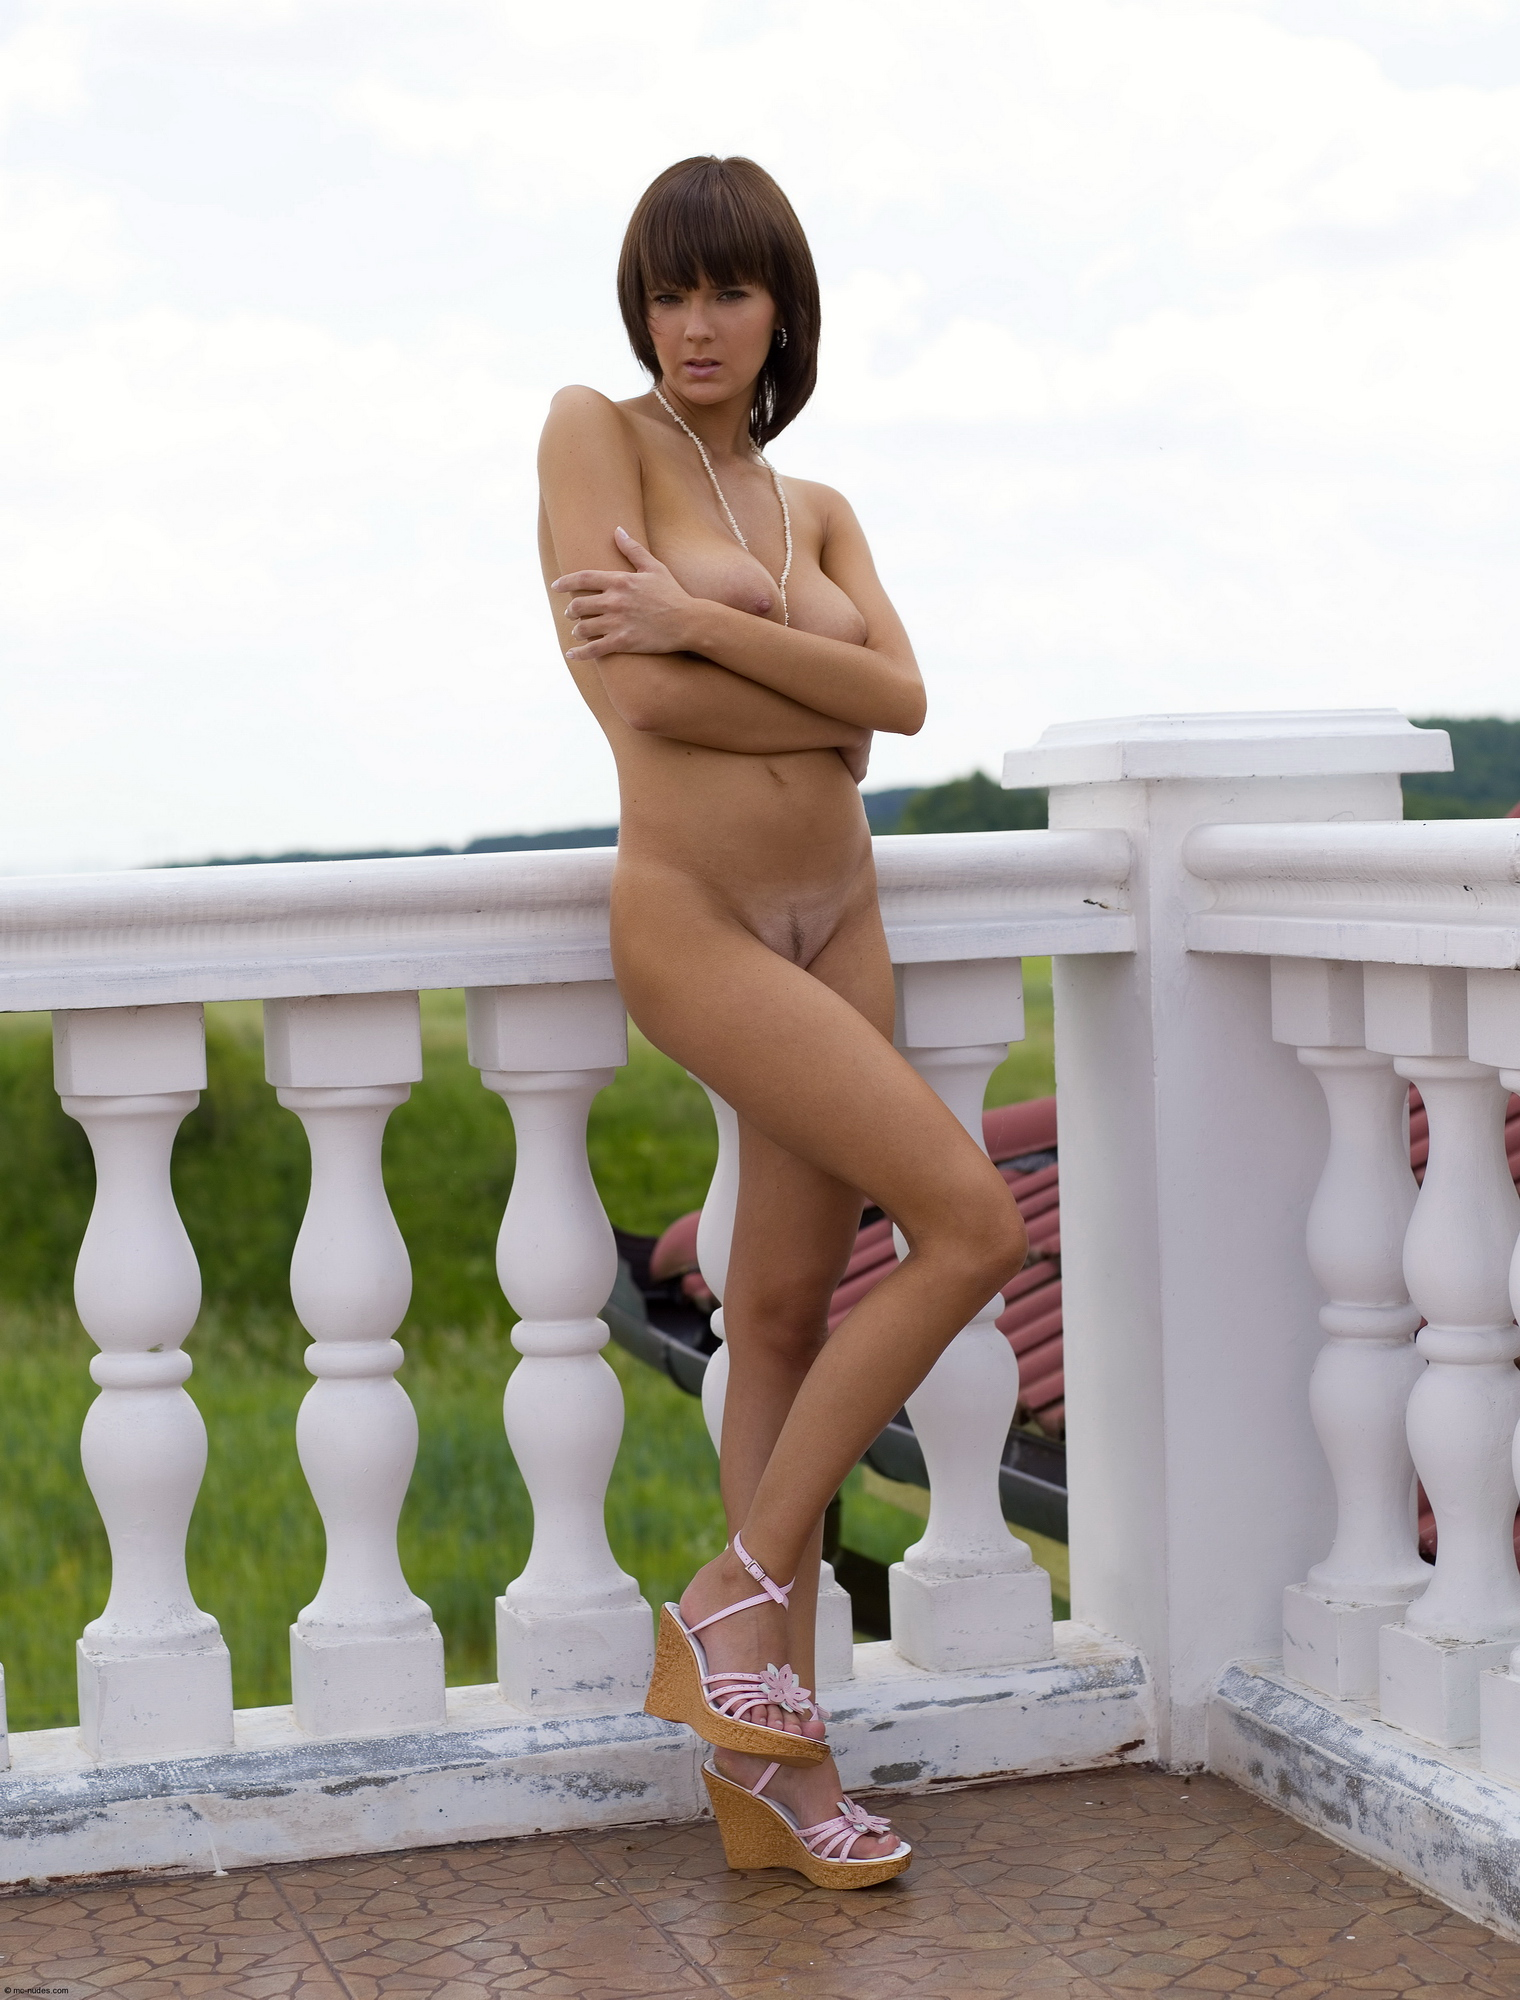 madison naked anal sex penetration